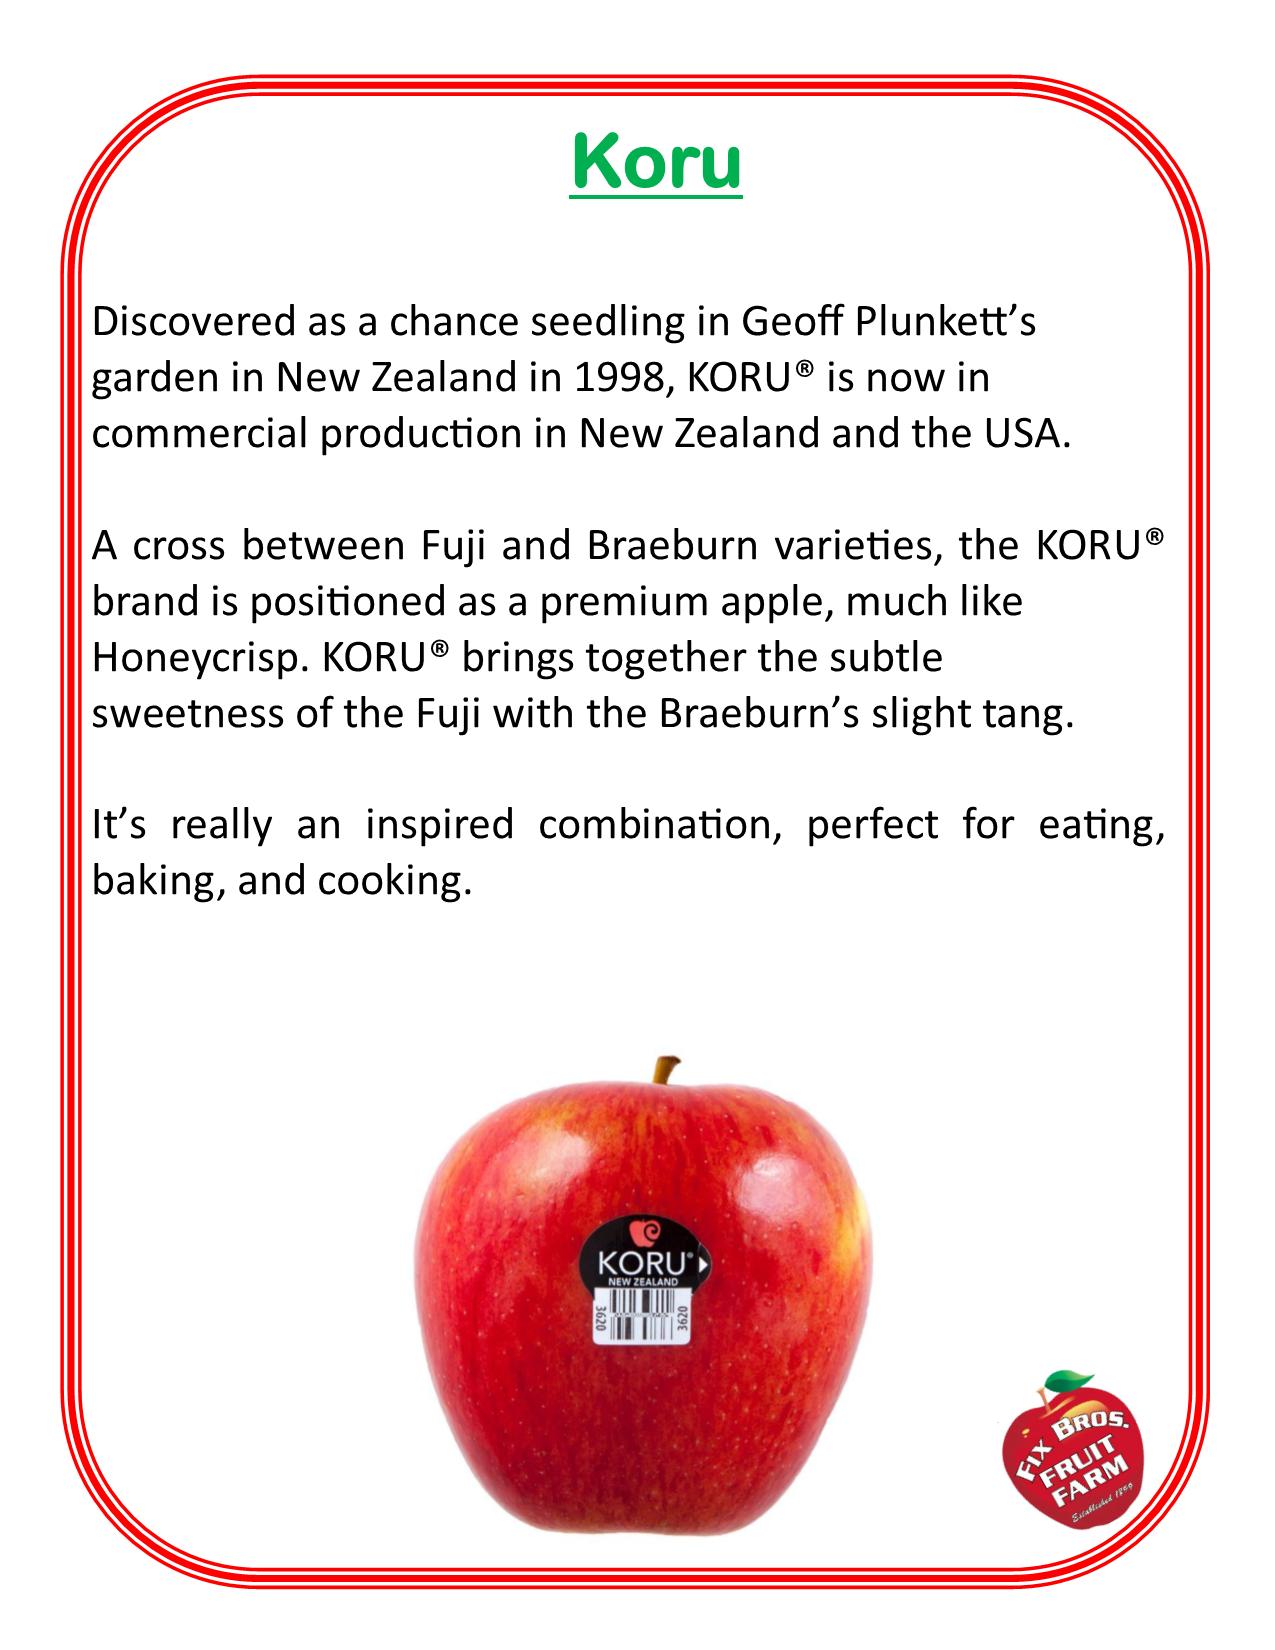 Koru apple description grown at Fix Bros Fruit Farm, Hudson, New York